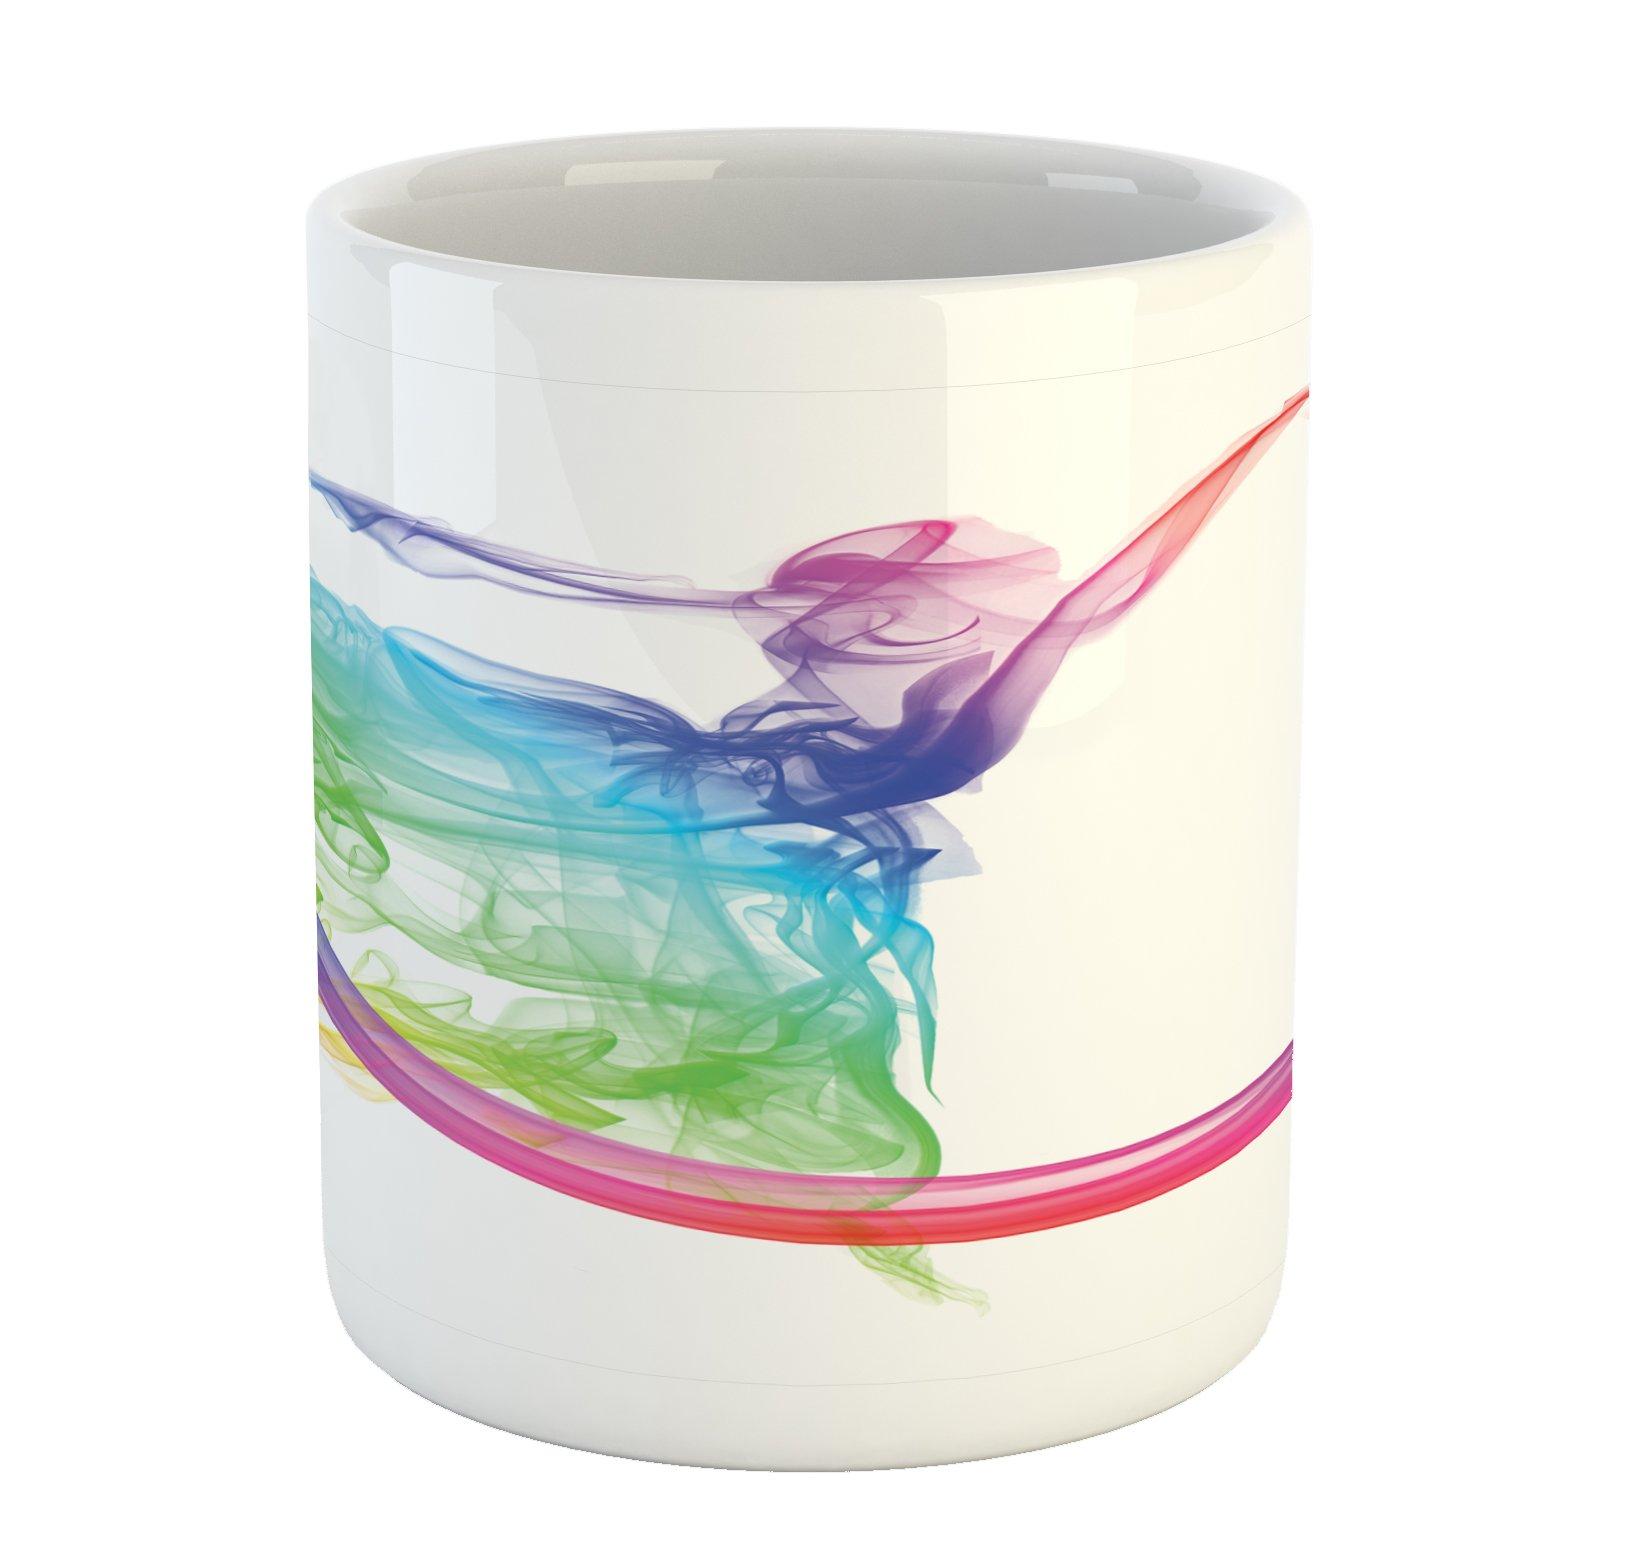 Lunarable Abstract Mug, Smoke Dance Shape Silhouette of Dancer Ballerina Rainbow Colors Fantasy Artistic, Printed Ceramic Coffee Mug Water Tea Drinks Cup, Multicolor